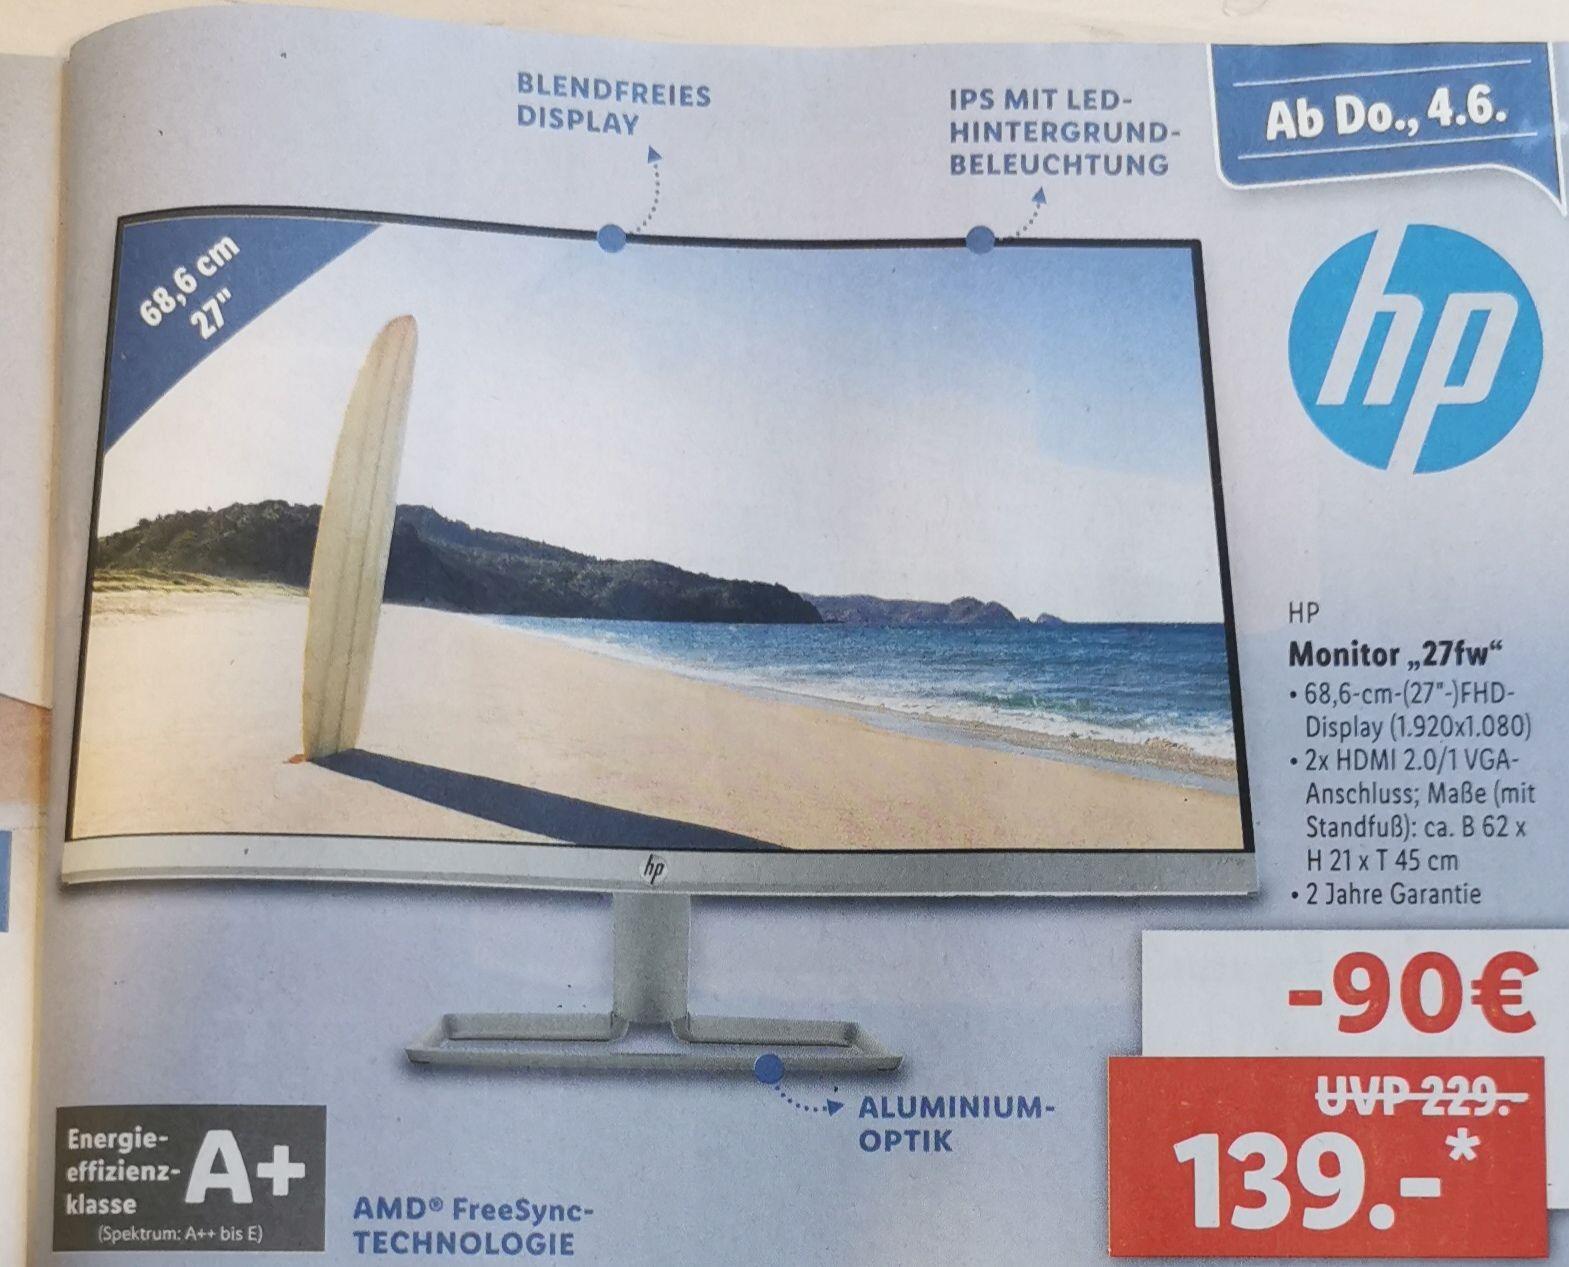 LIDL Monitor HP 27fw